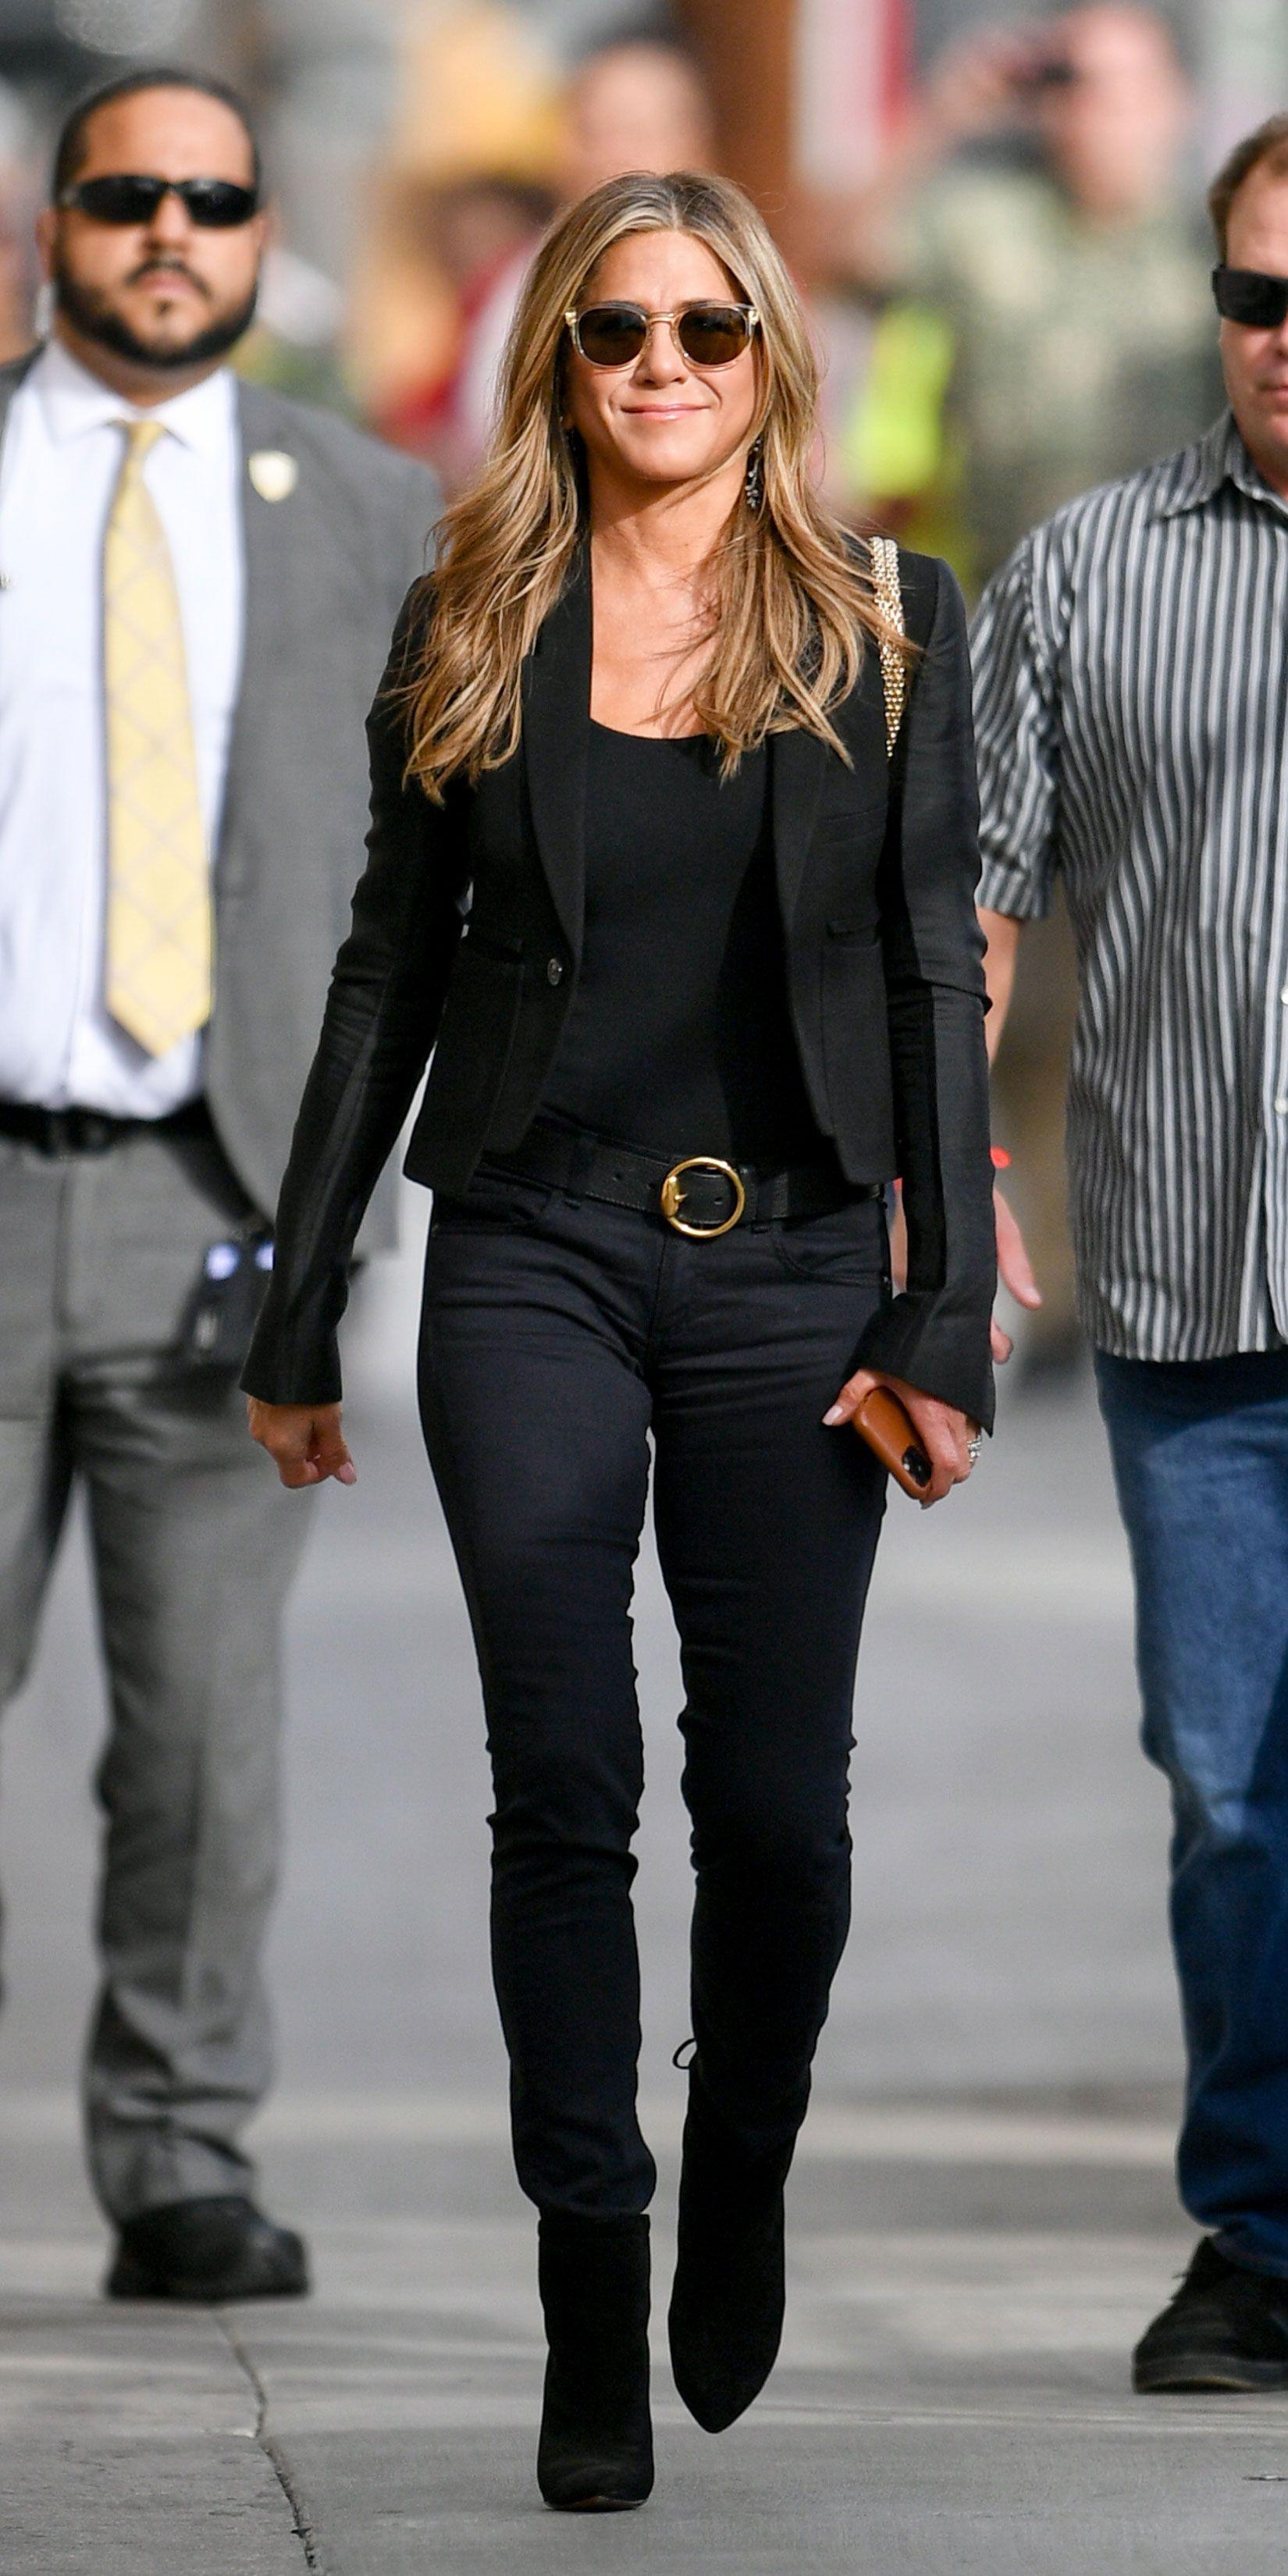 Look of the Day -   - #AngelinaJolie #CelebrityStyle #Day #HollywoodActresses #littletattooideas #skulltattoo #unusualtattoos